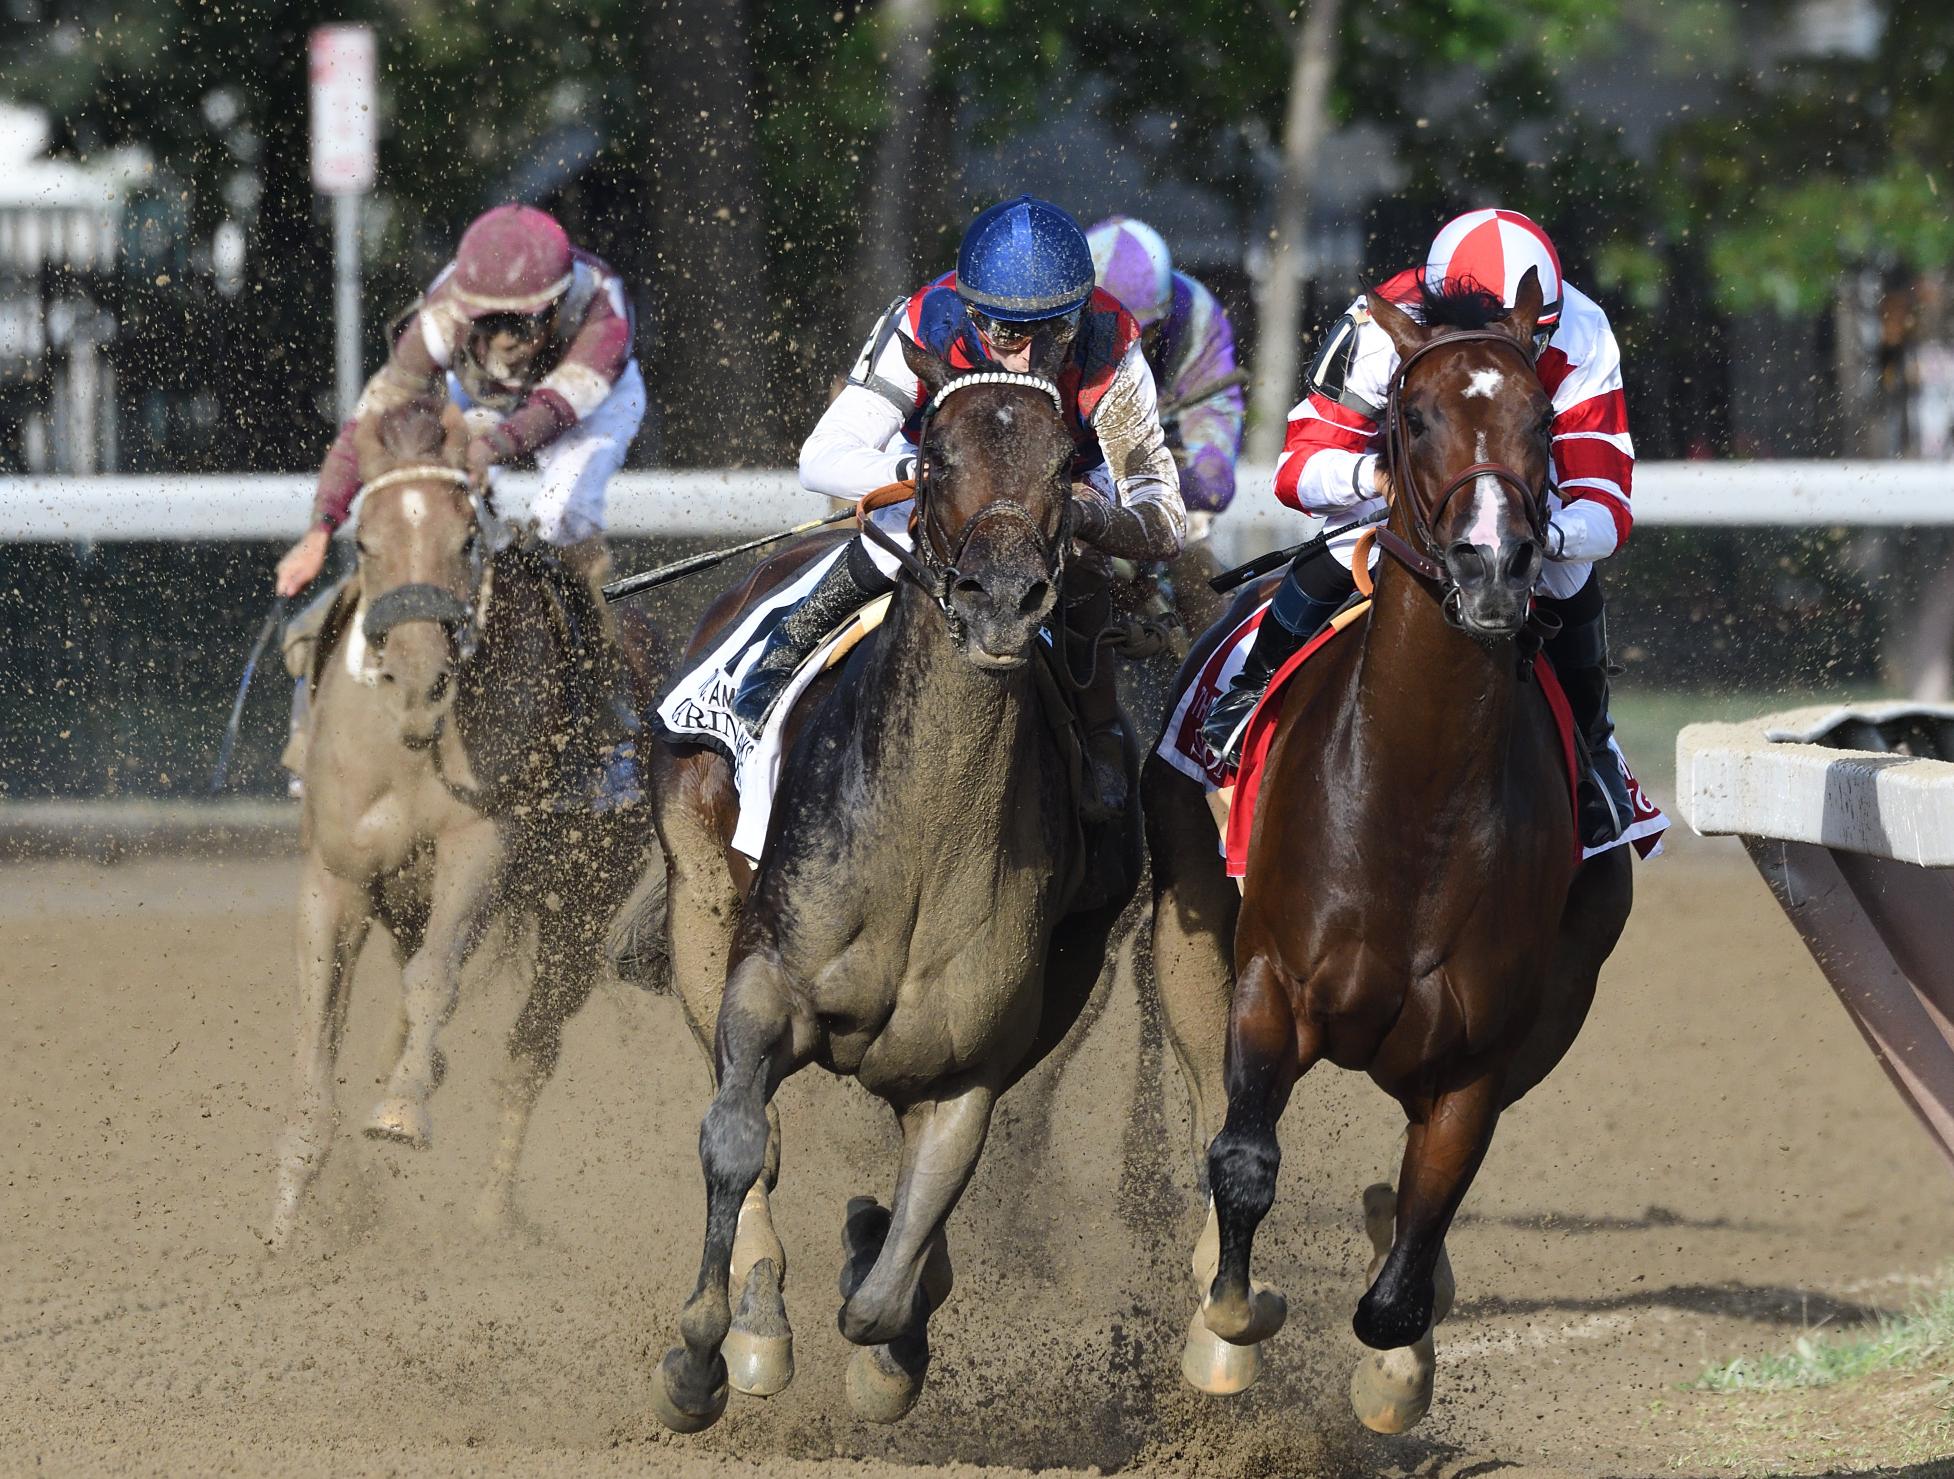 Saratoga Racing August 17 – Race 2 Analysis, Picks & Best Bets